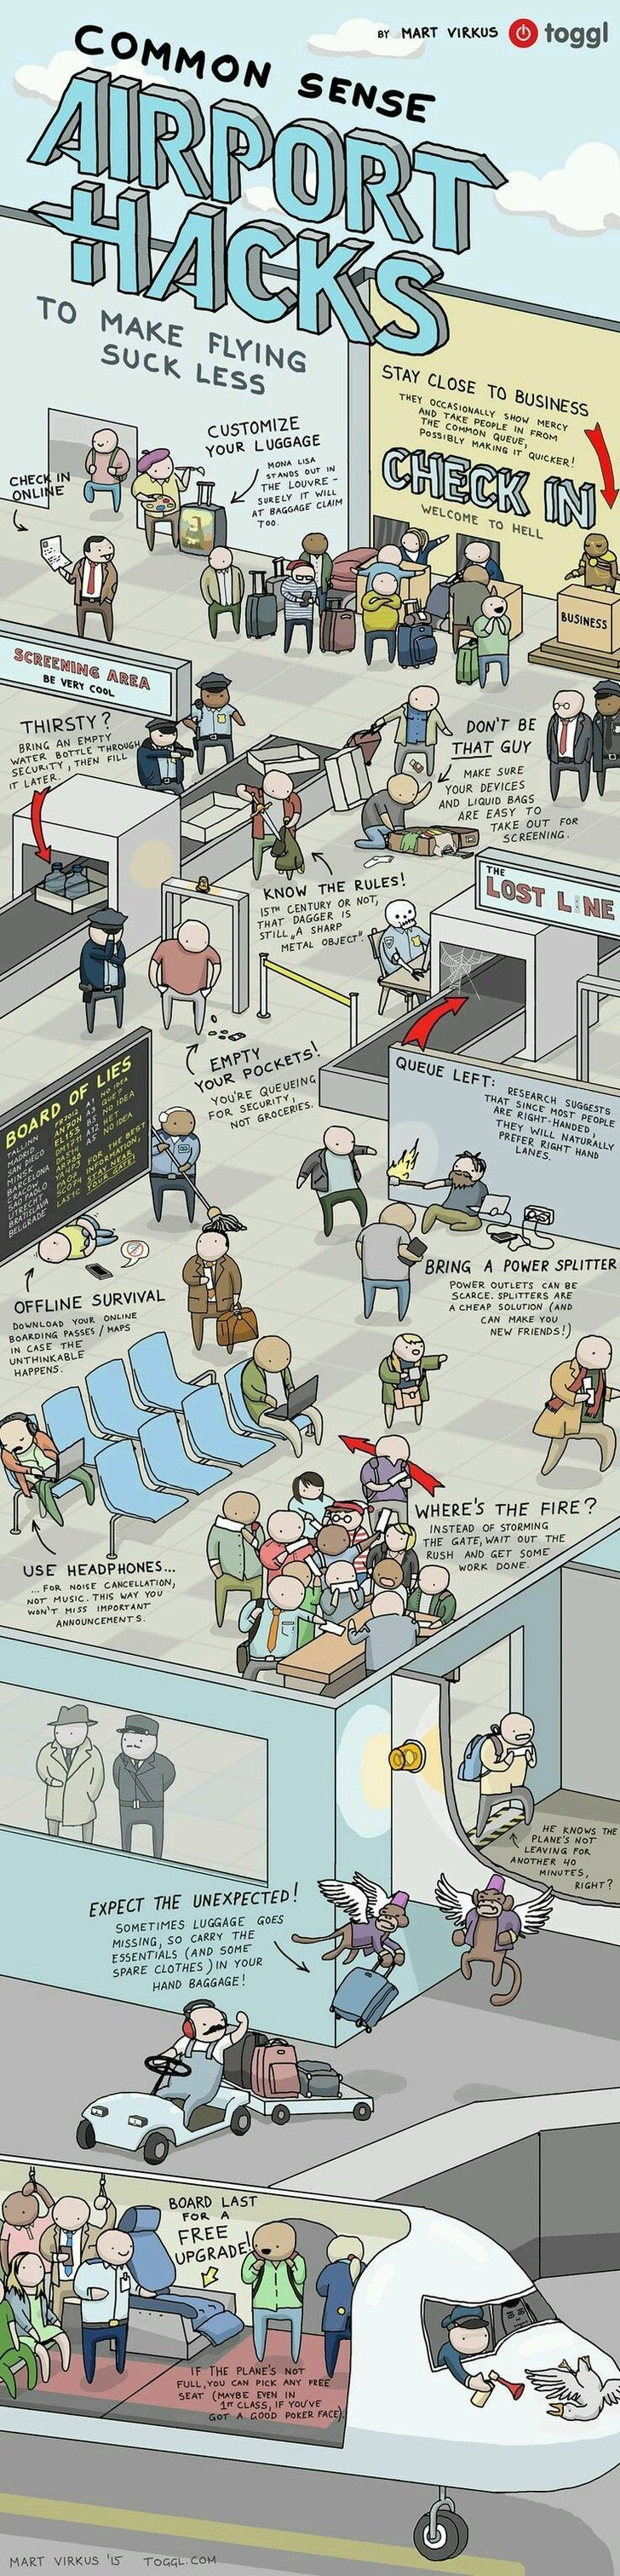 Airport hacks #travelhacks